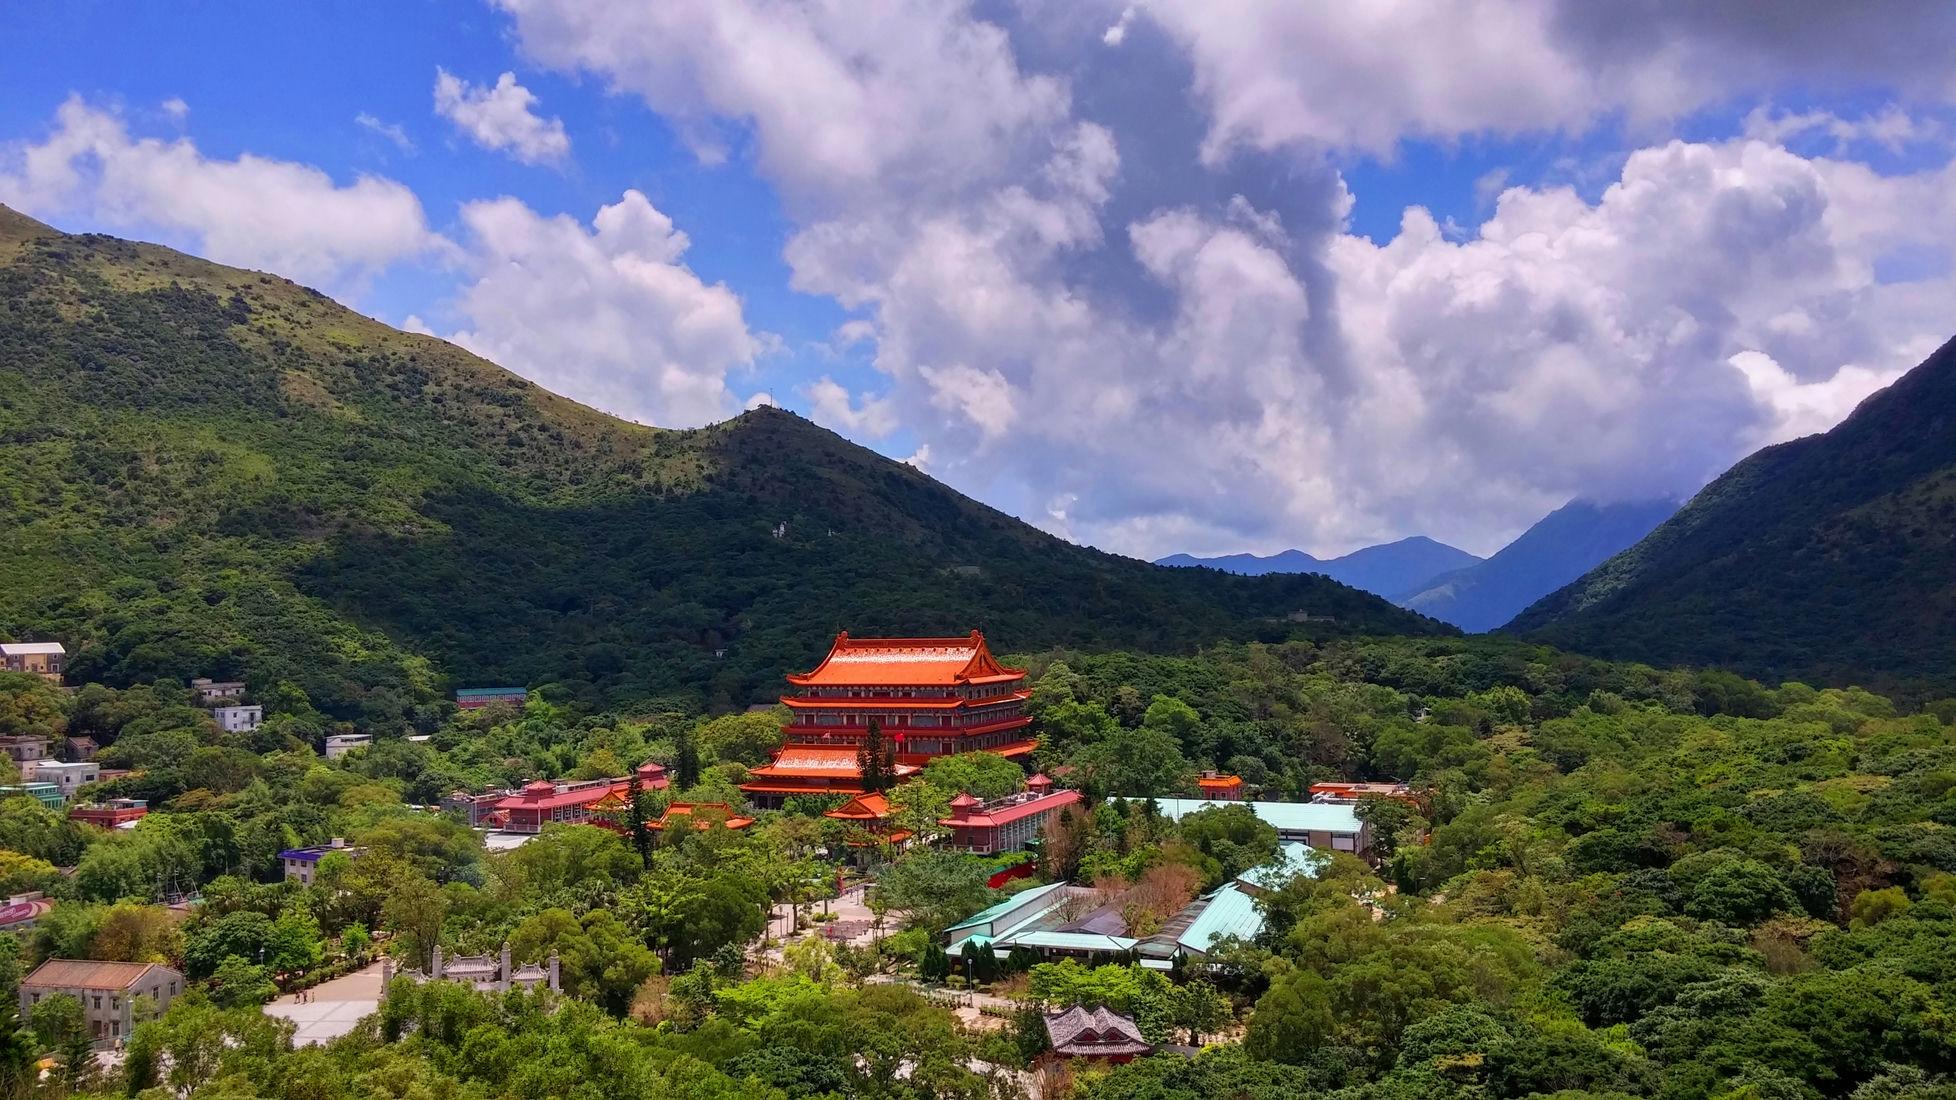 Po Lin Monastery Great Hall of Heroes and Ten Thousand Buddhas Hall from Big Buddha